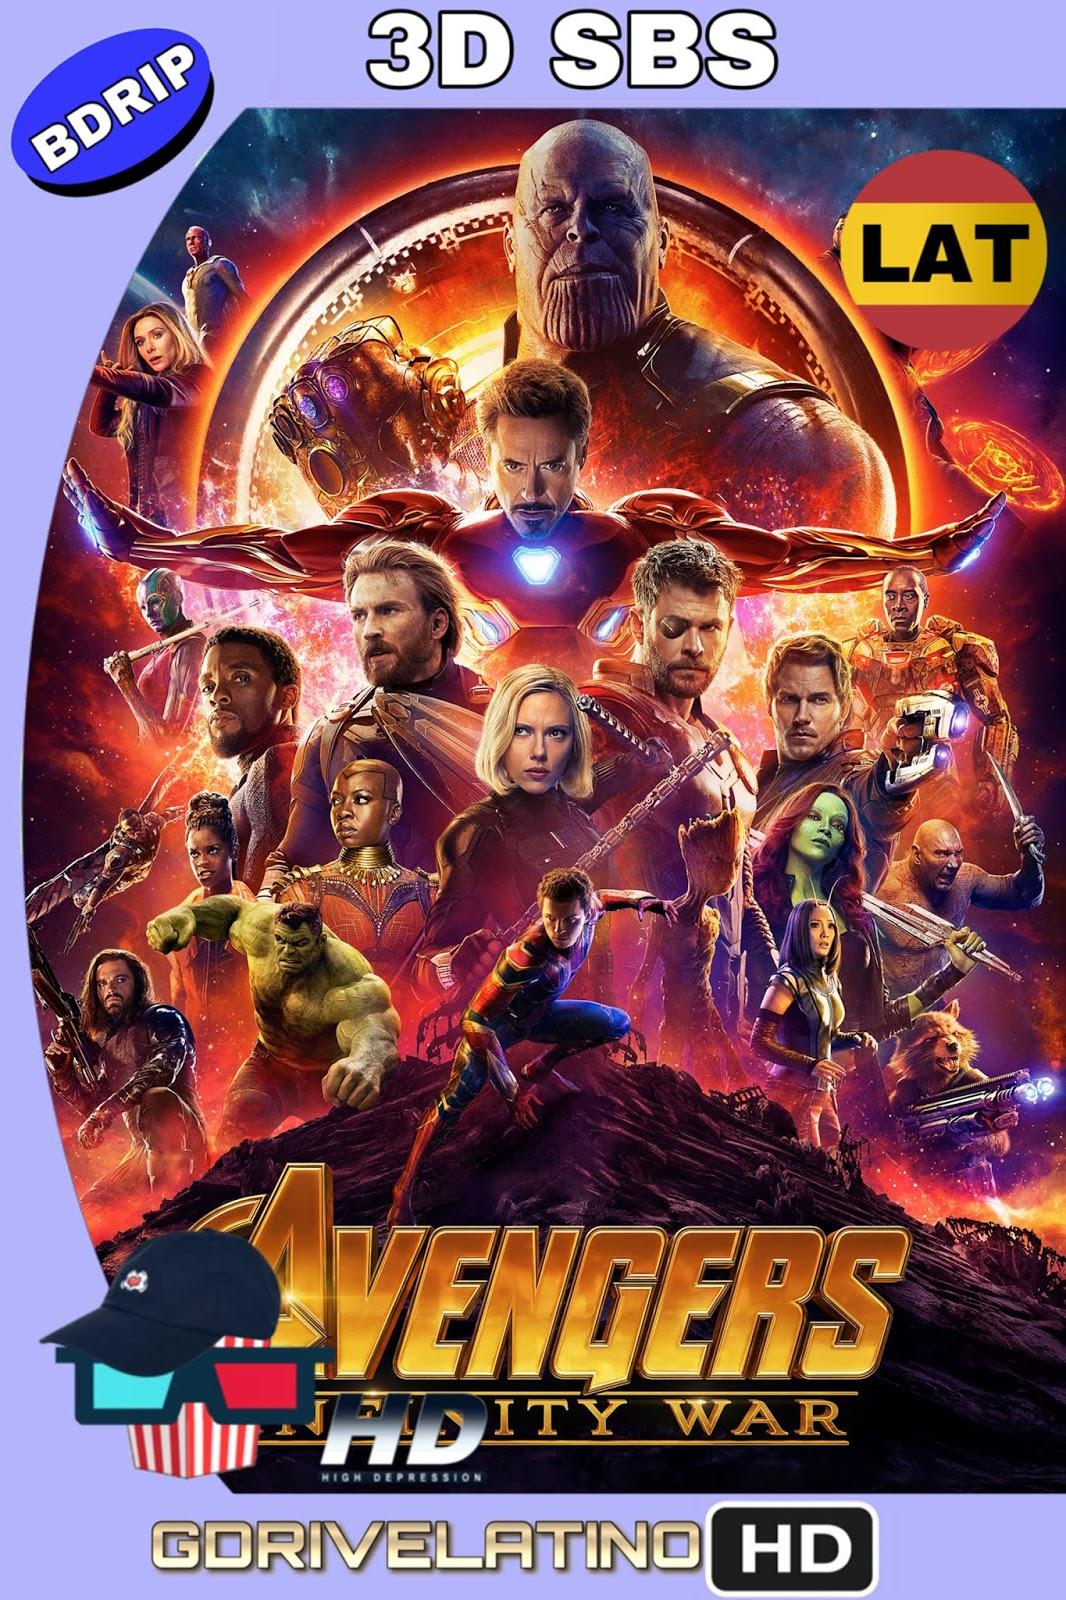 Avengers: Infinity War (2018) BDRip 1080p 3D SBS (Latino – Inglés) MKV